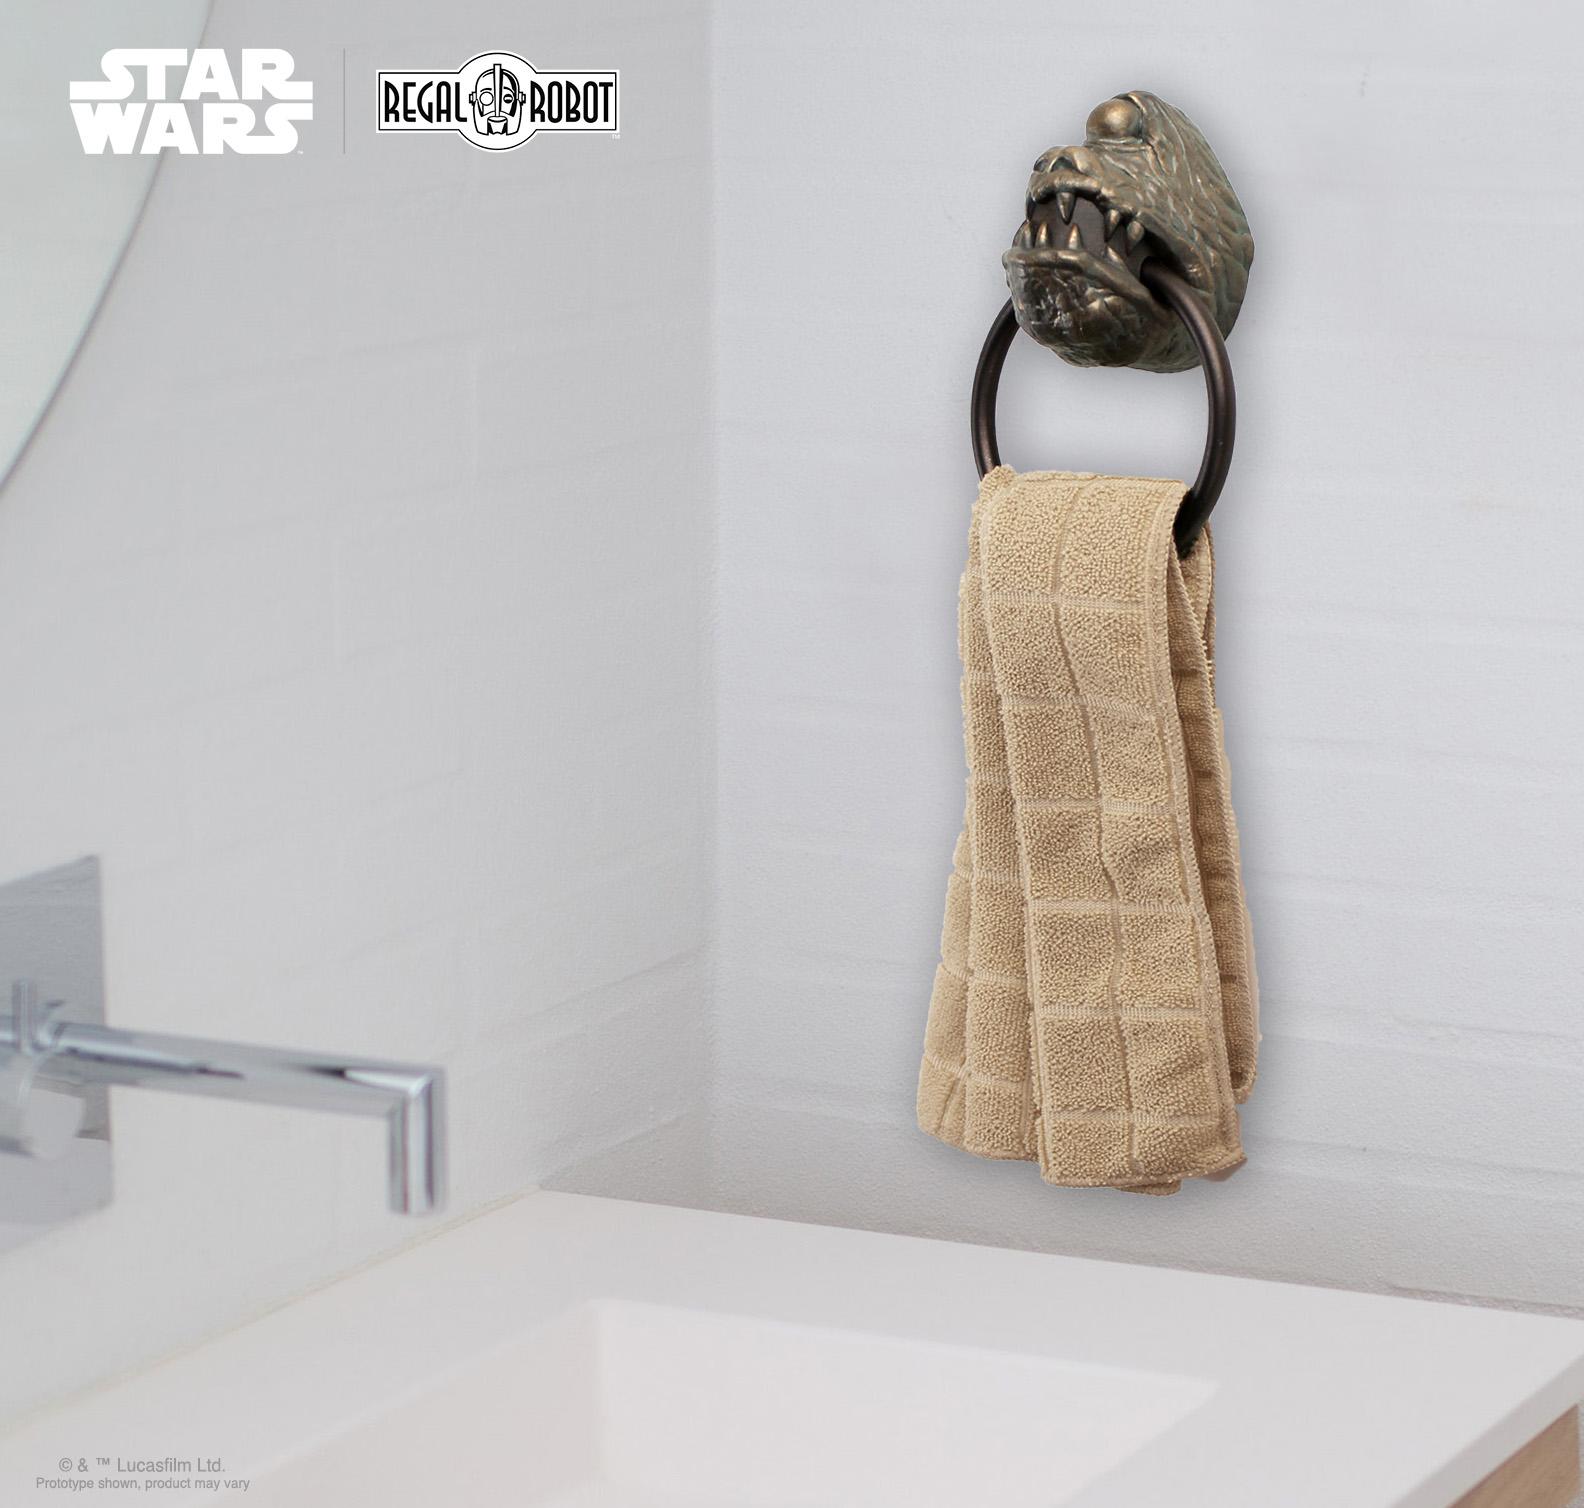 Jabba's palace replica wall decor